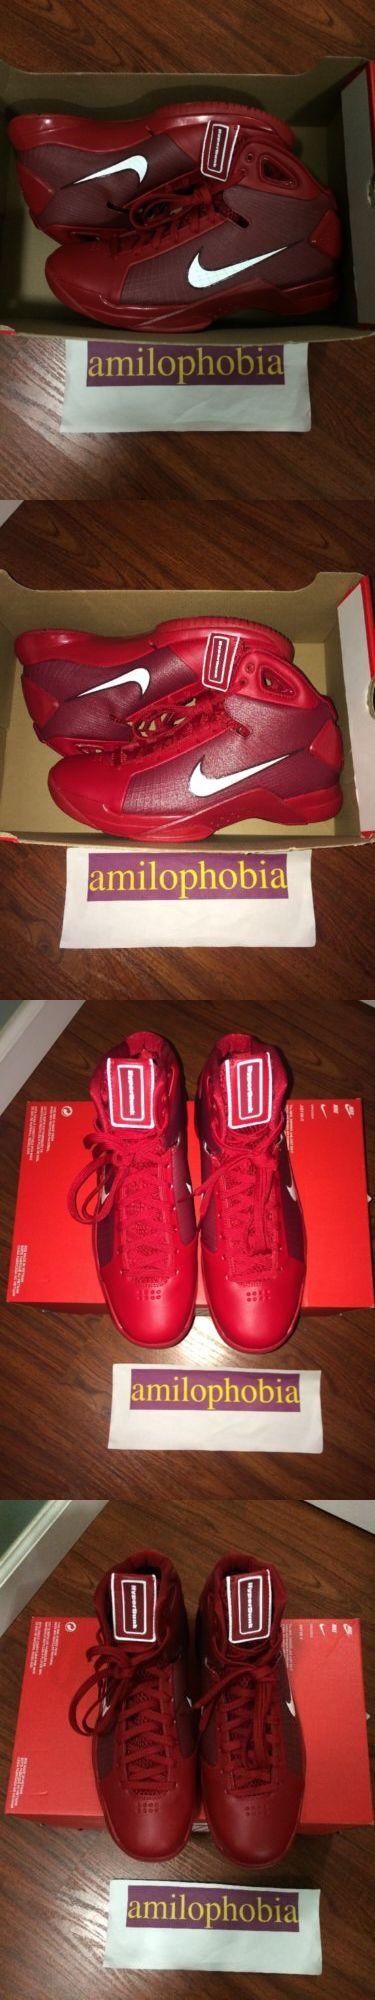 Men 158971: New Men S Nike Hyperdunk 08 Size 11 Red White Basketball Shoes -> BUY IT NOW ONLY: $48.48 on eBay!